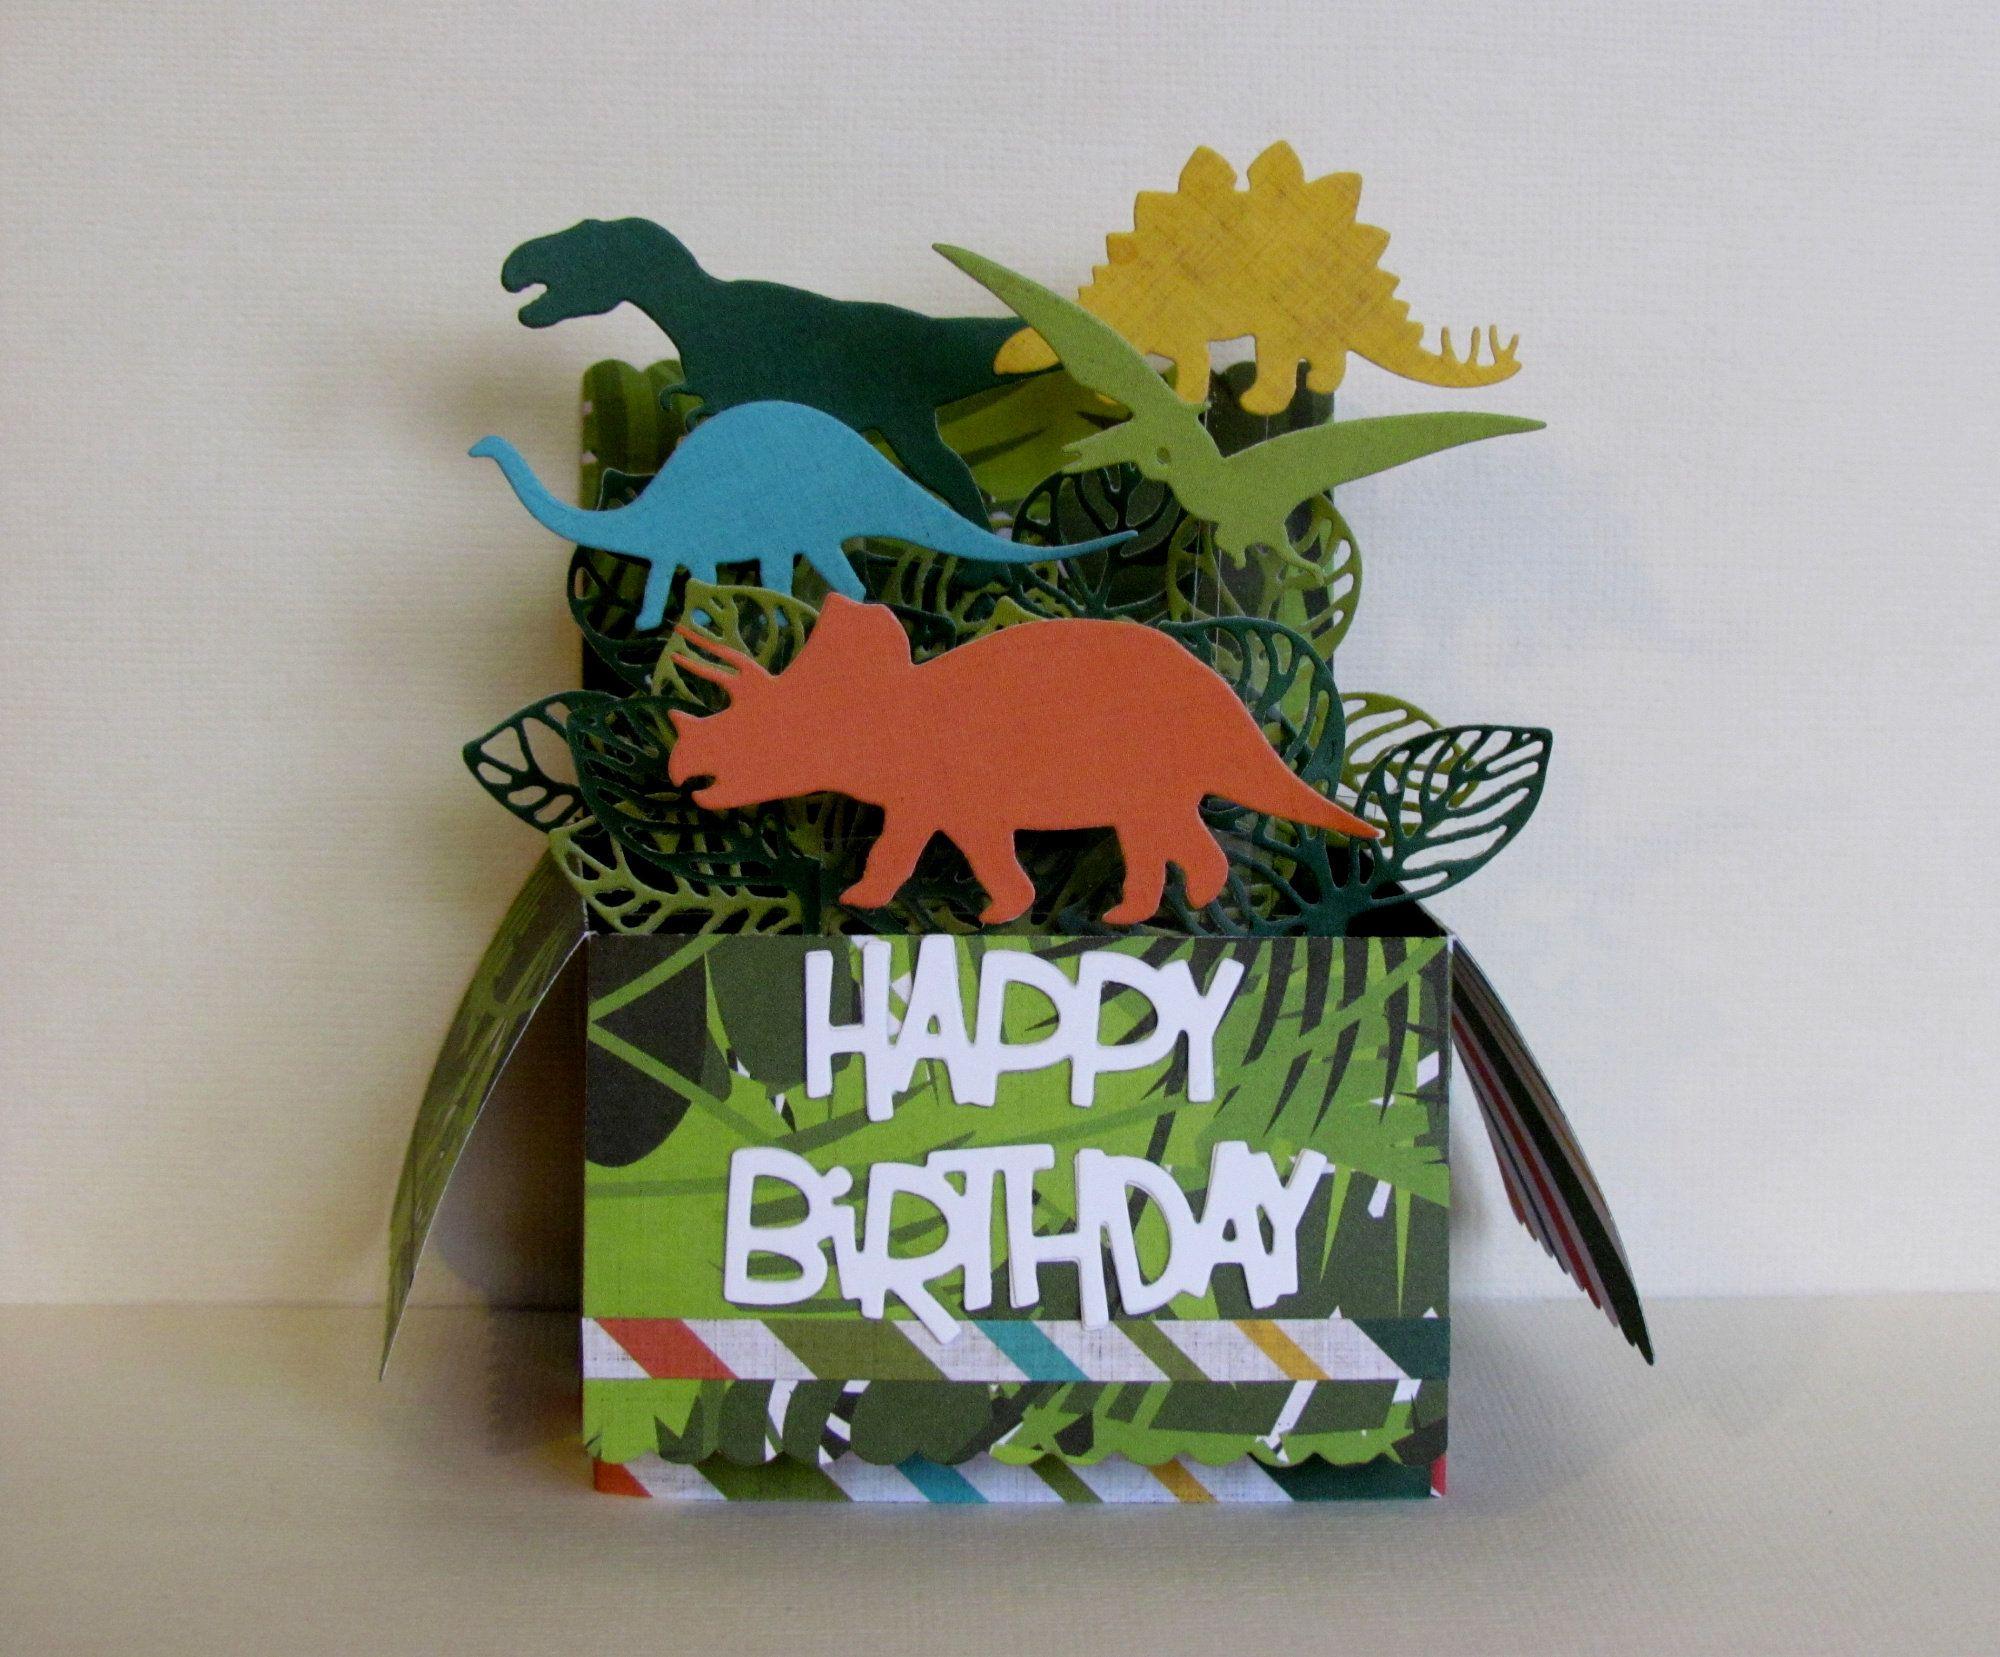 Dinosaur Pop Up Box Card Happy Birthday Card Children S Etsy Pop Up Box Cards Pop Up Card Templates Card Box